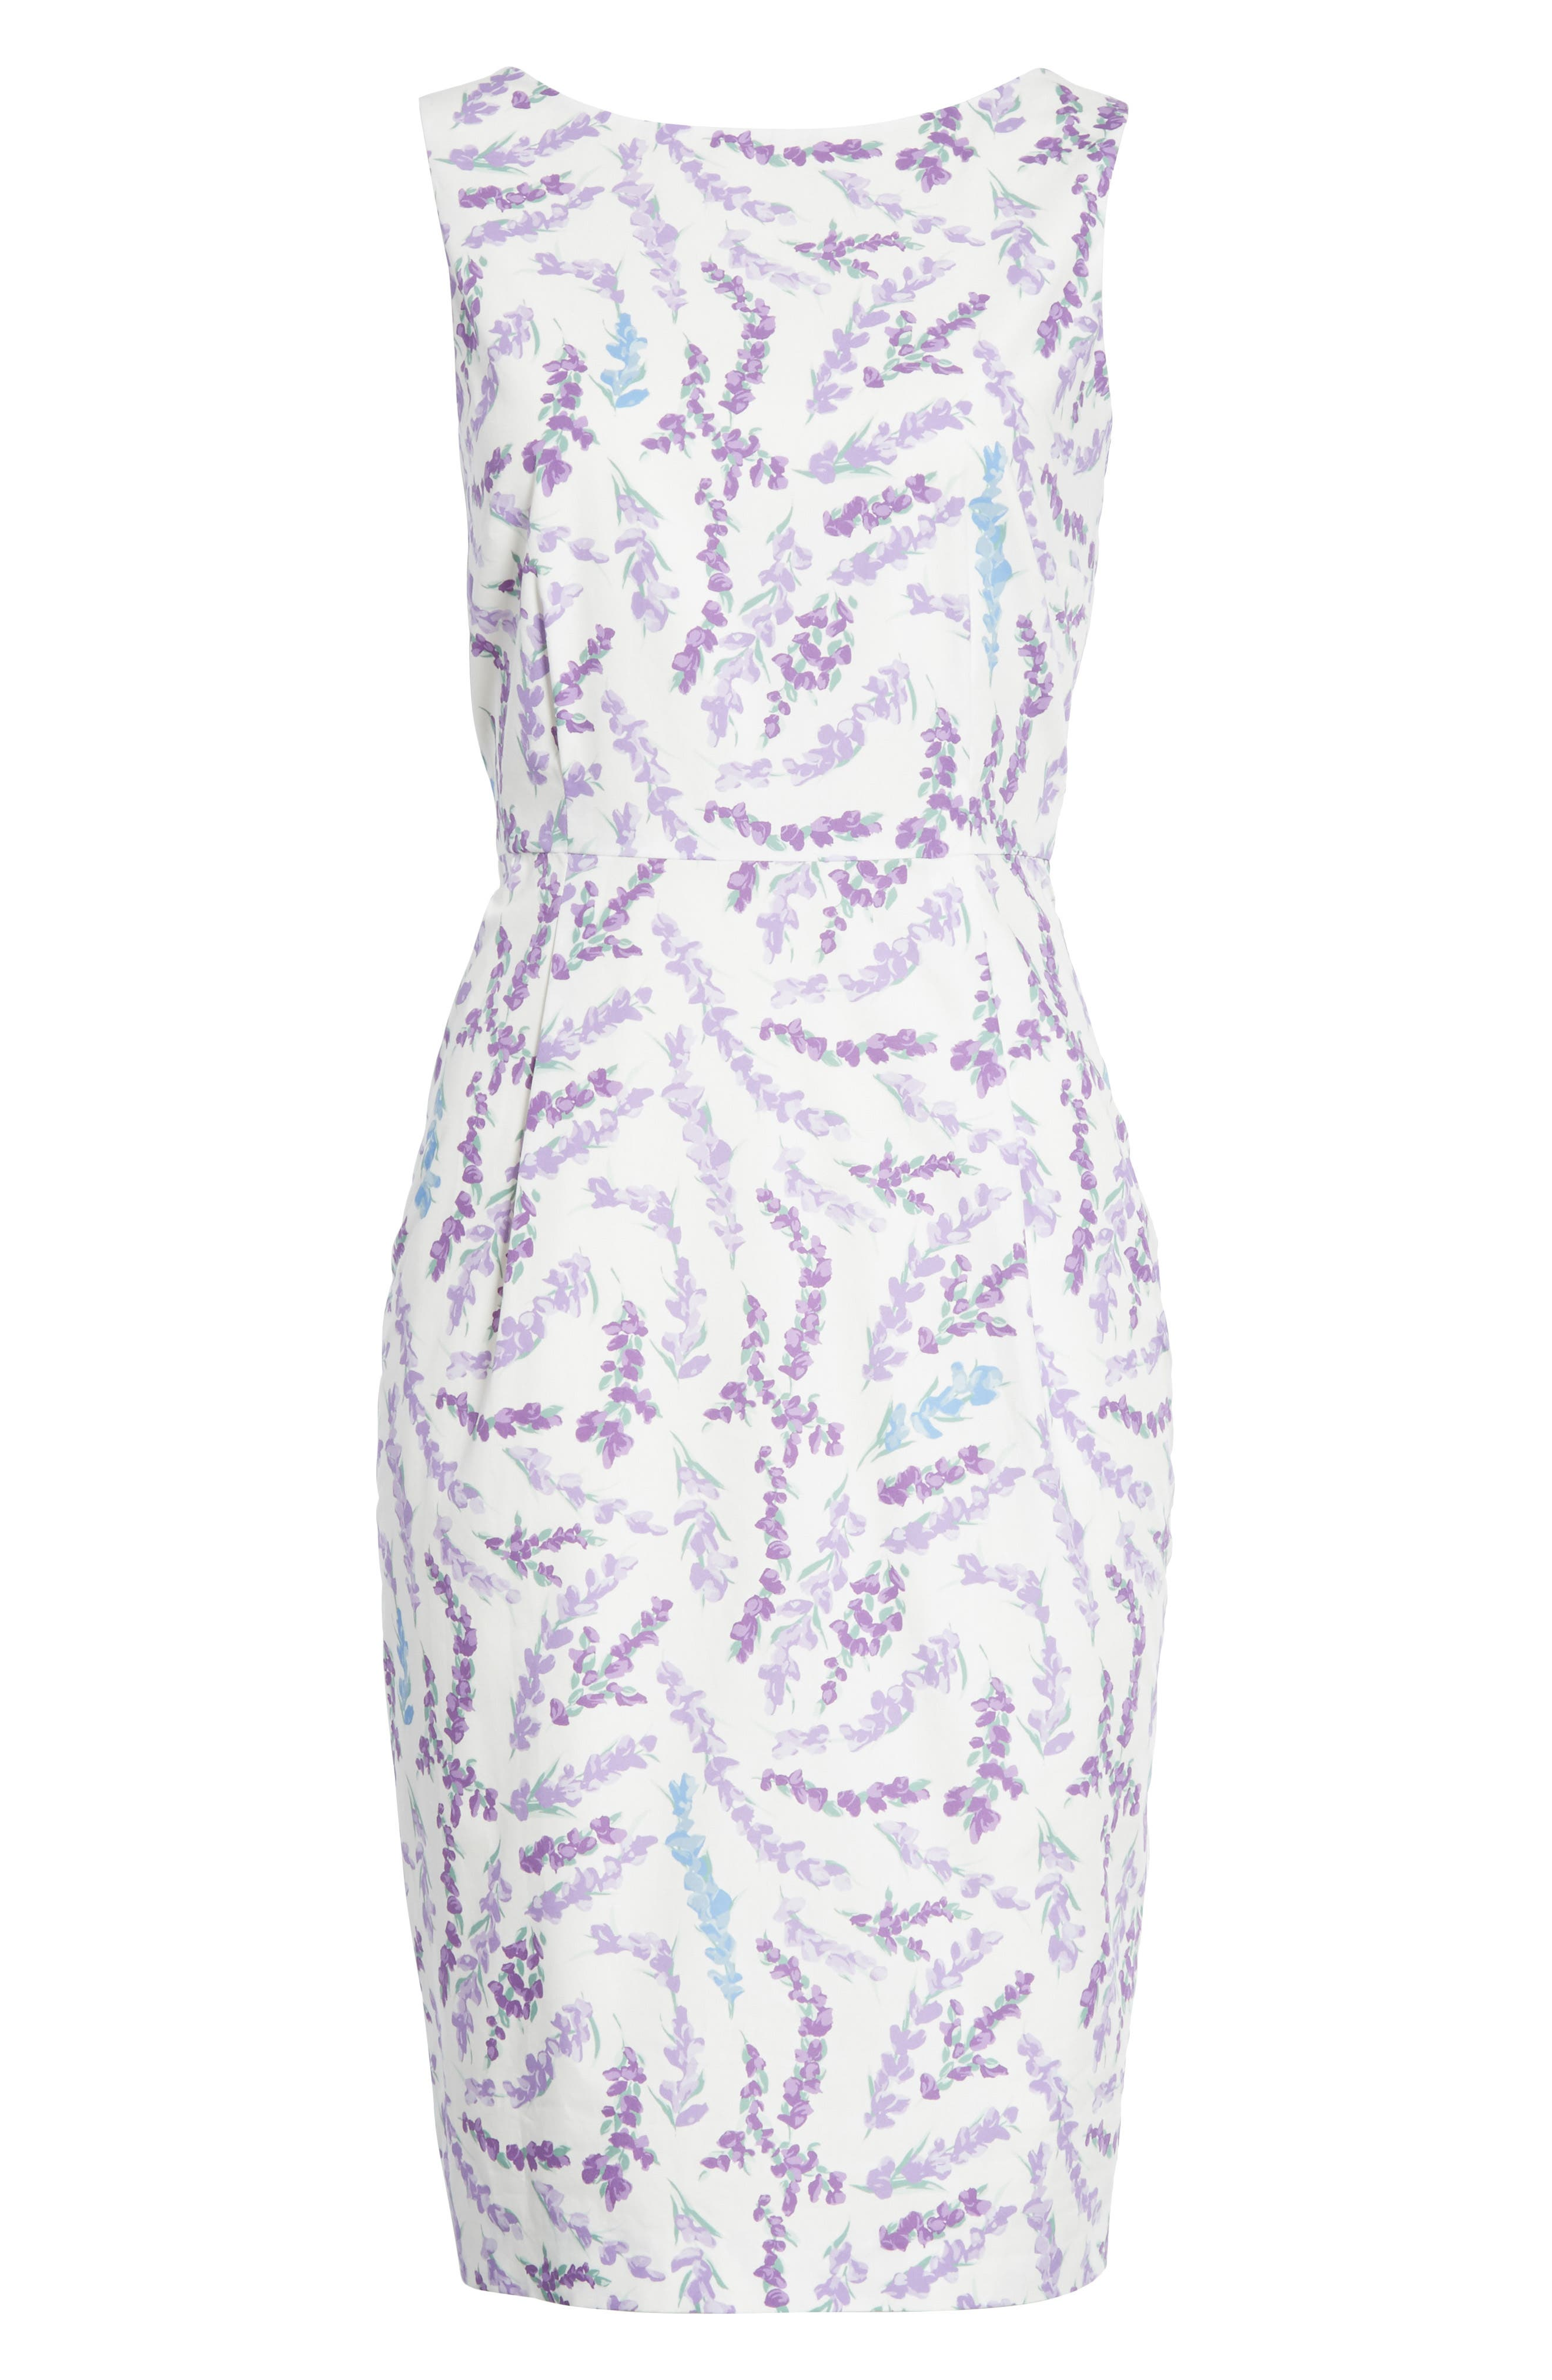 Melfi Print Cotton Sheath Dress,                             Alternate thumbnail 7, color,                             Lavender